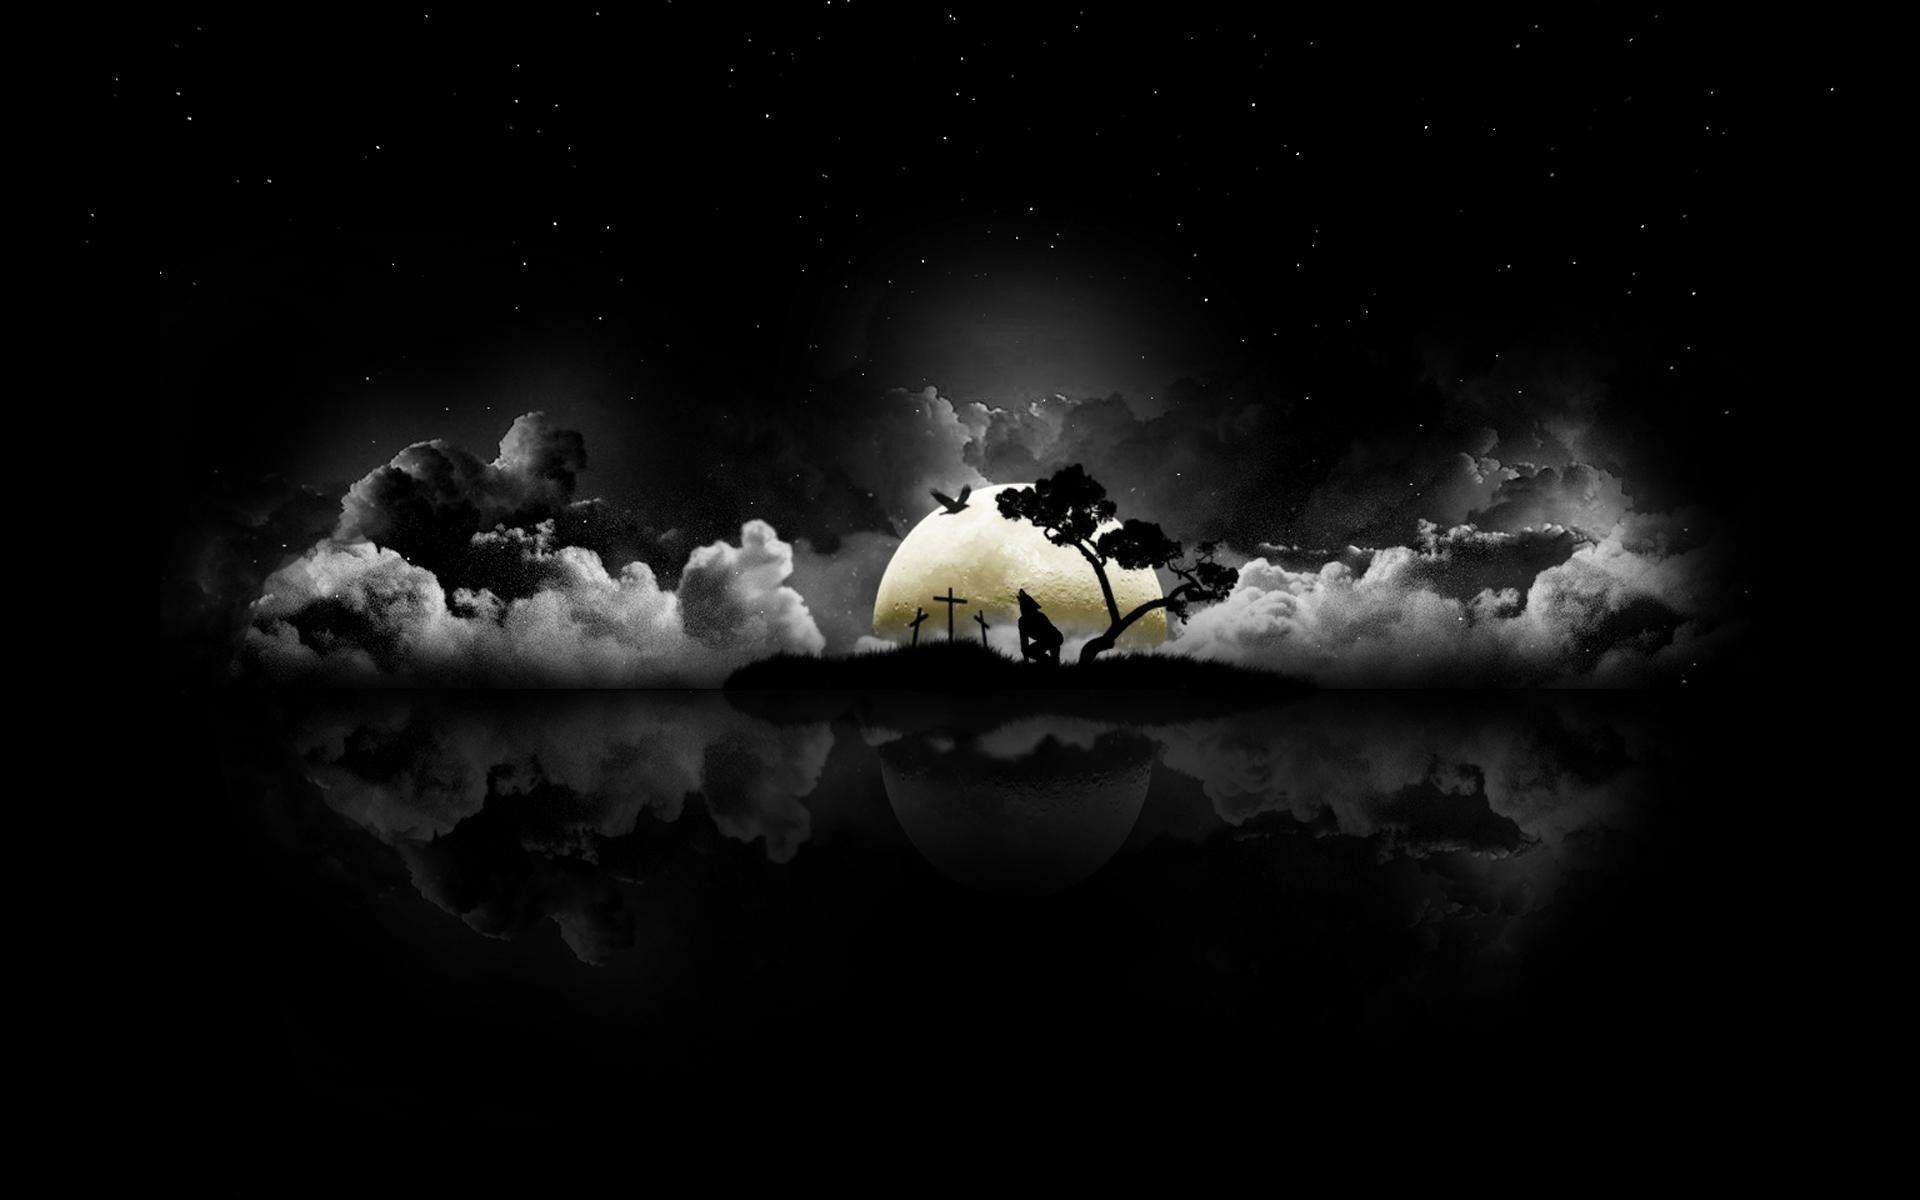 Anime Black Scenery Wallpaper - Anime Wallpaper HD